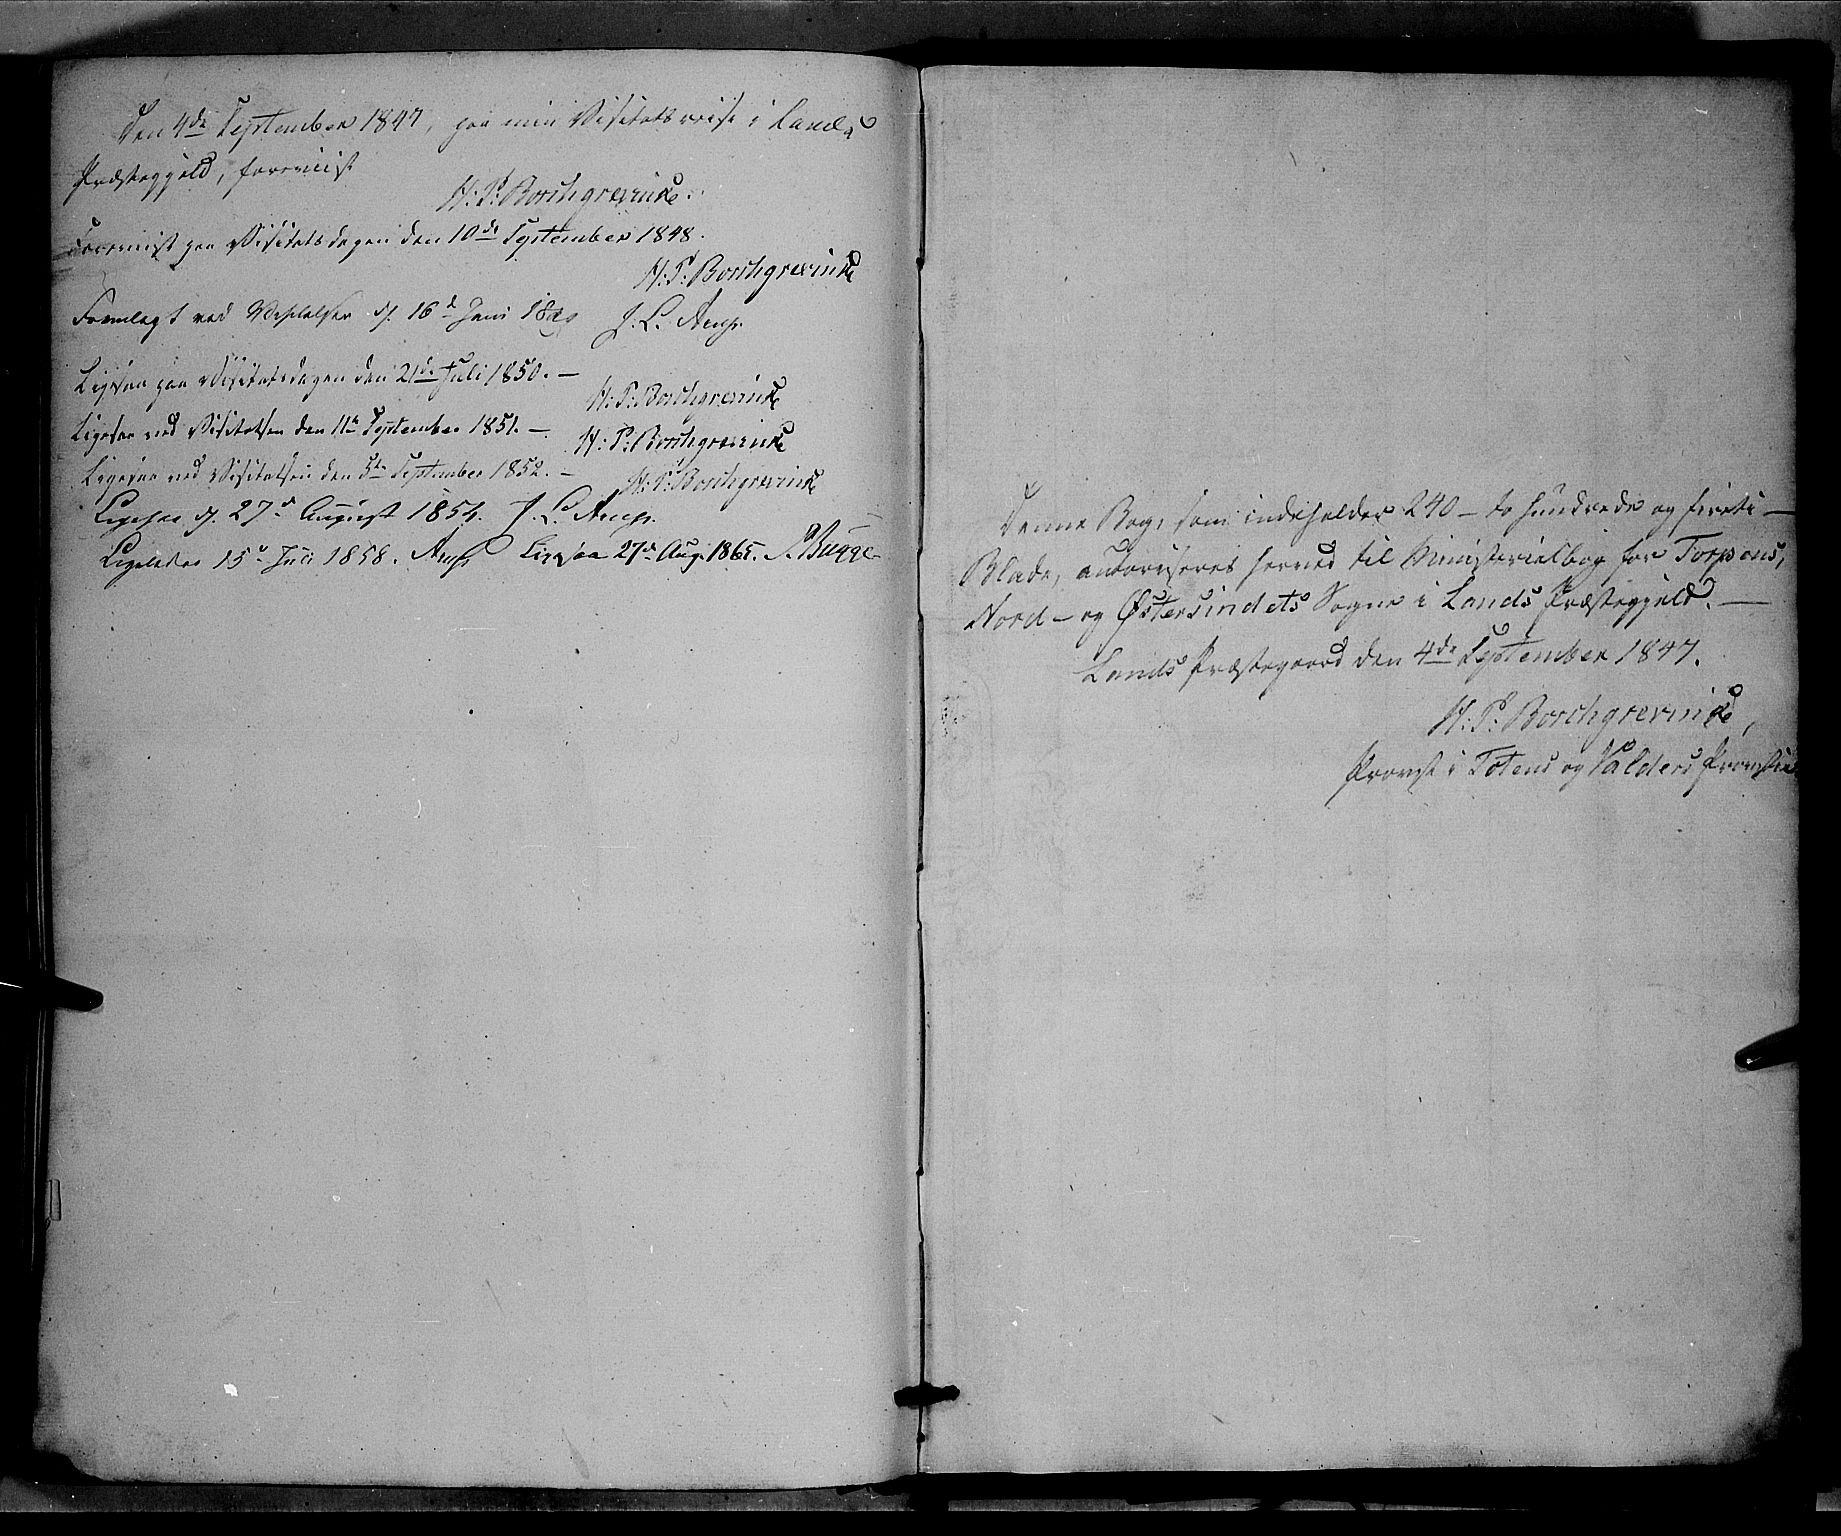 SAH, Land prestekontor, Ministerialbok nr. 10, 1847-1859